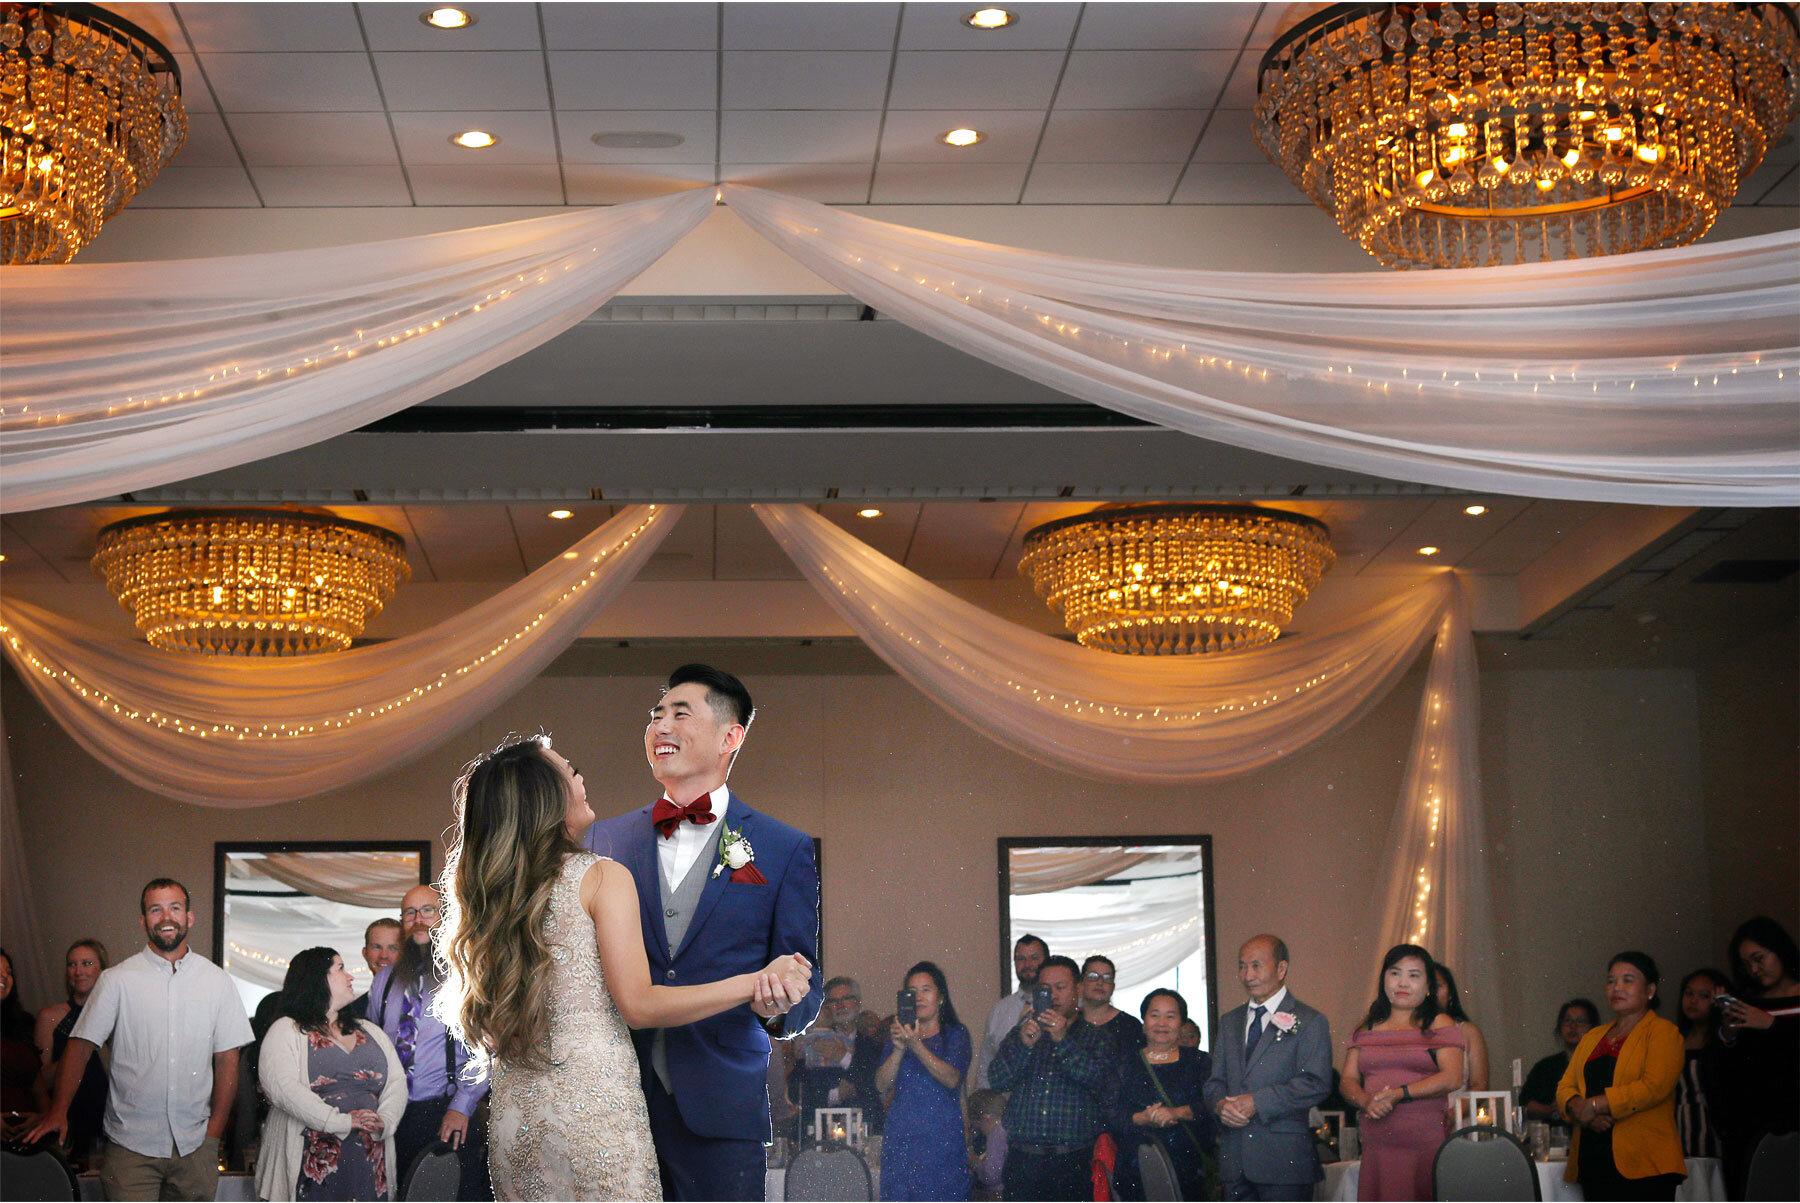 16-Vick-Photography-Minneapolis-Minnesota-The-Graduate-Hotel-Reception-Bride-Groom-First-Dance-Mai-&-Ross.jpg